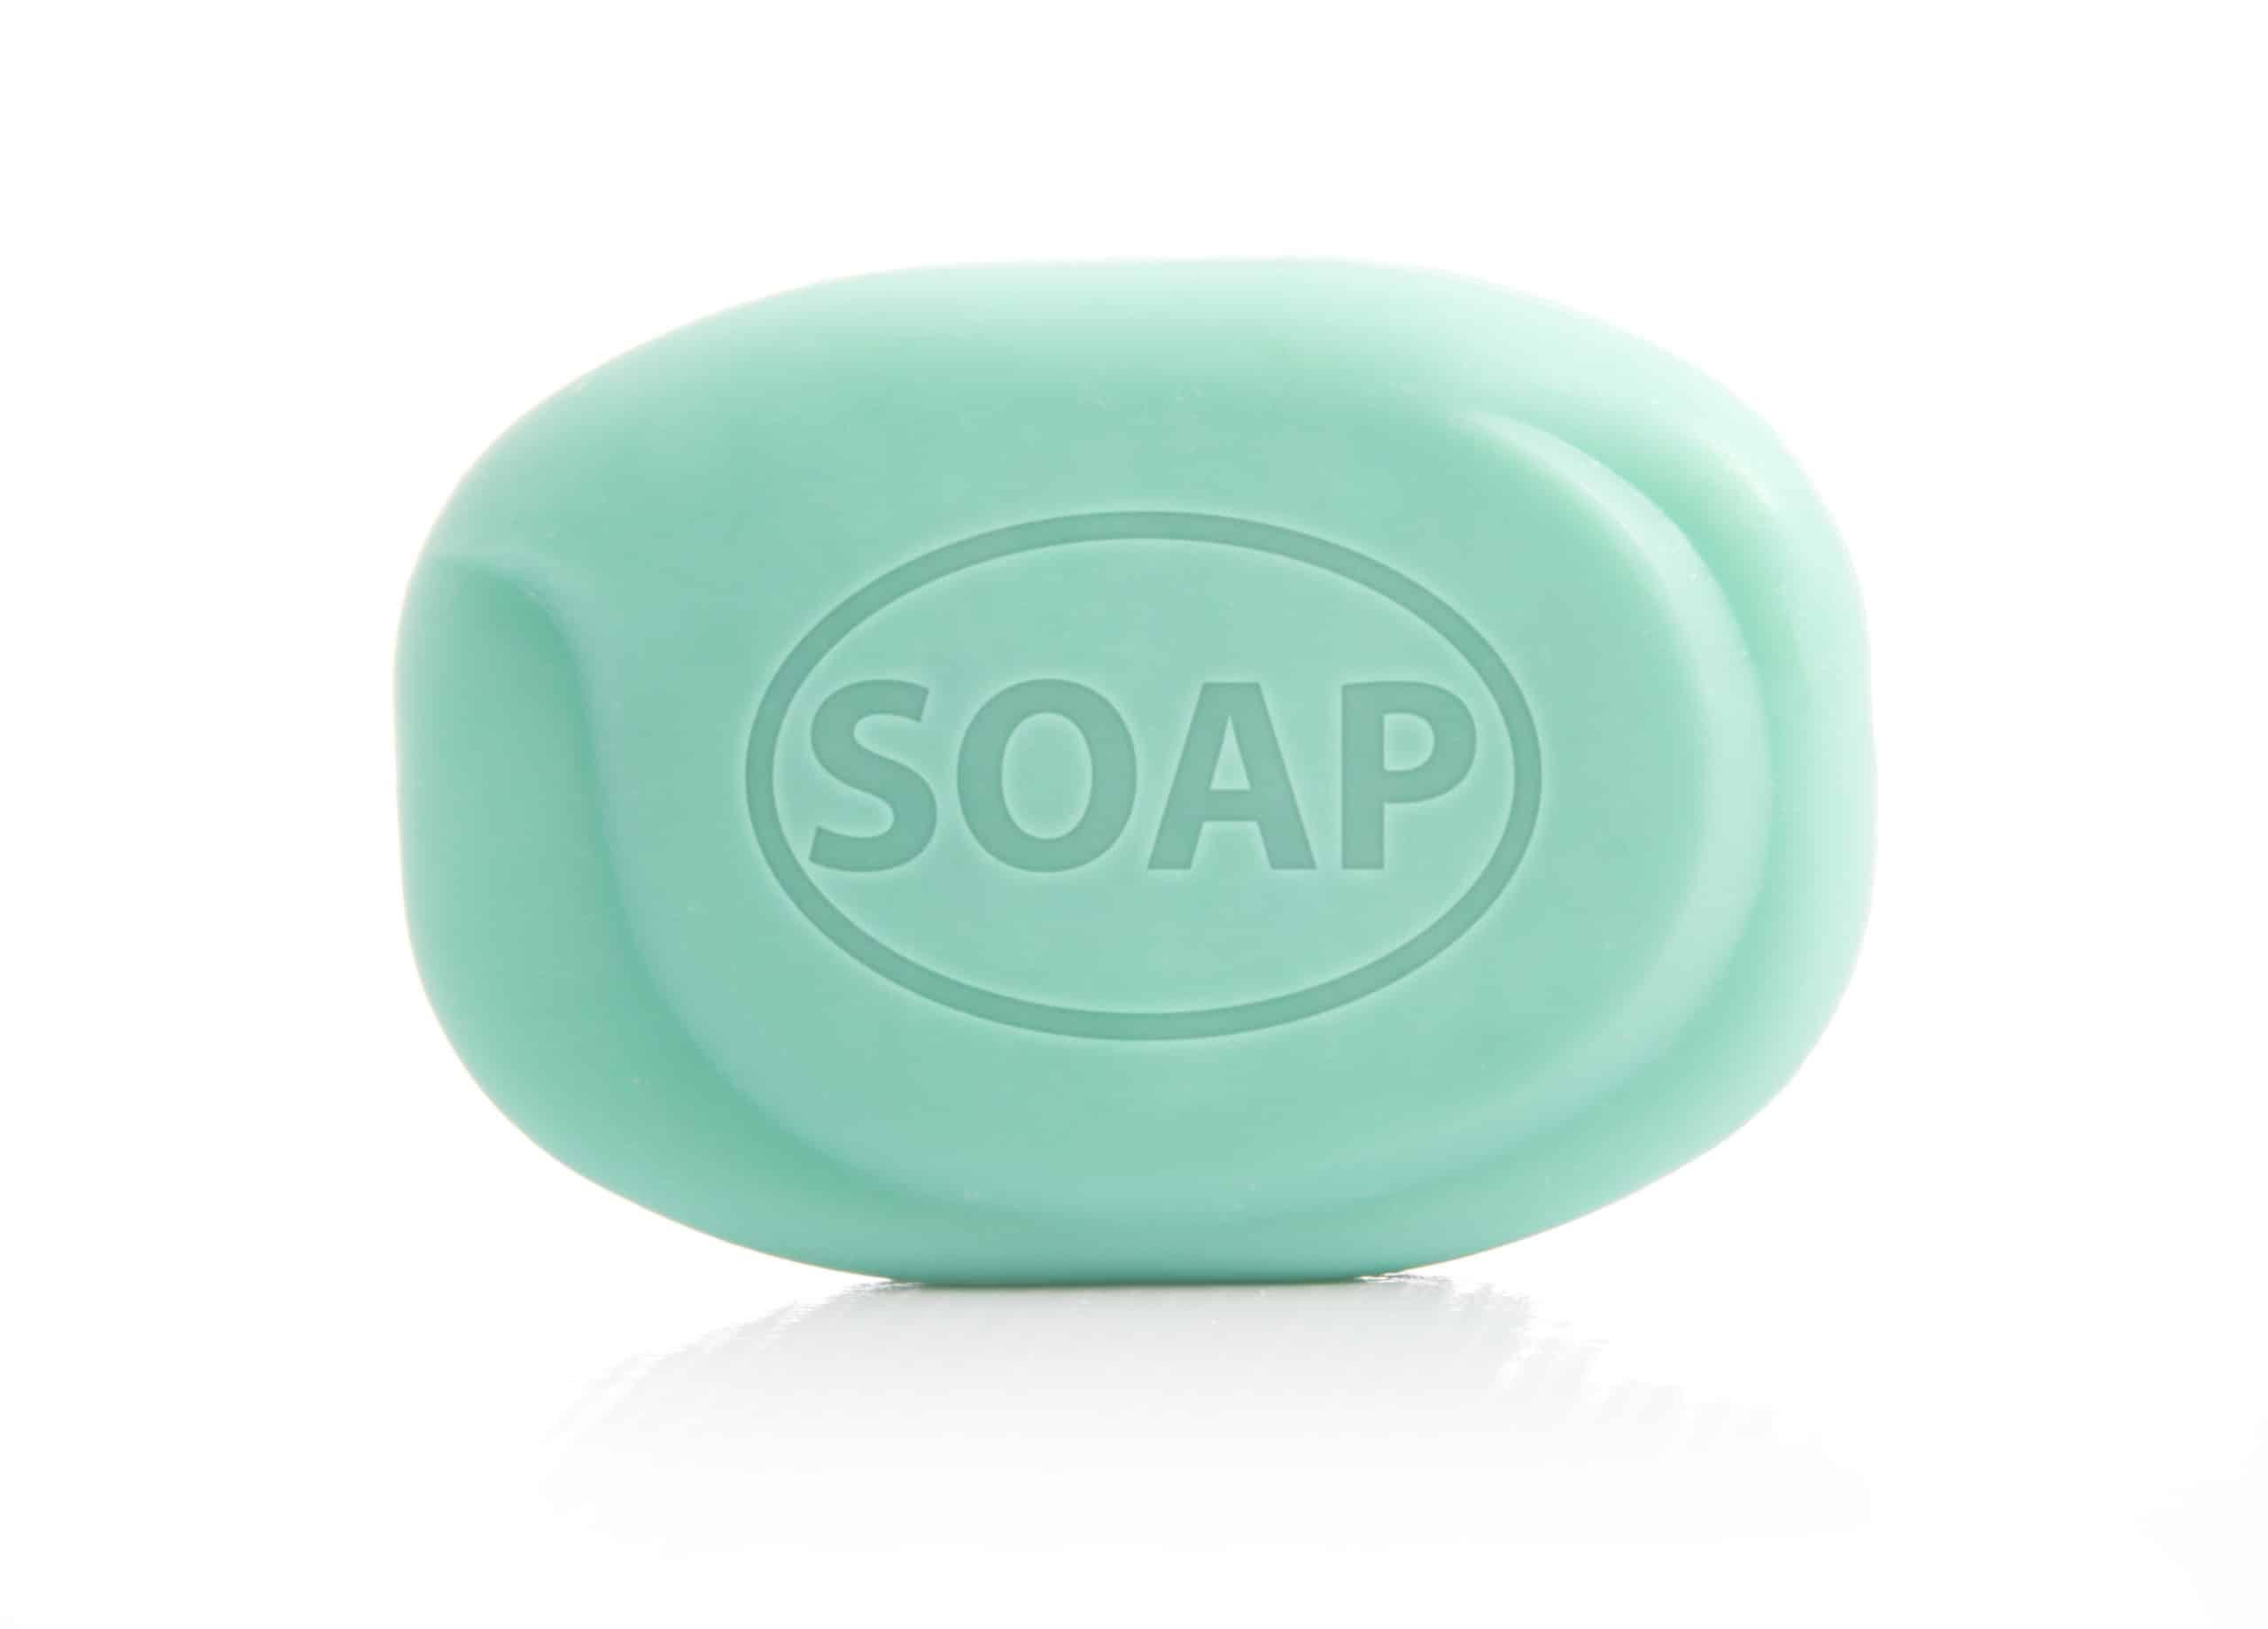 Soap Bar Isolated on White Background